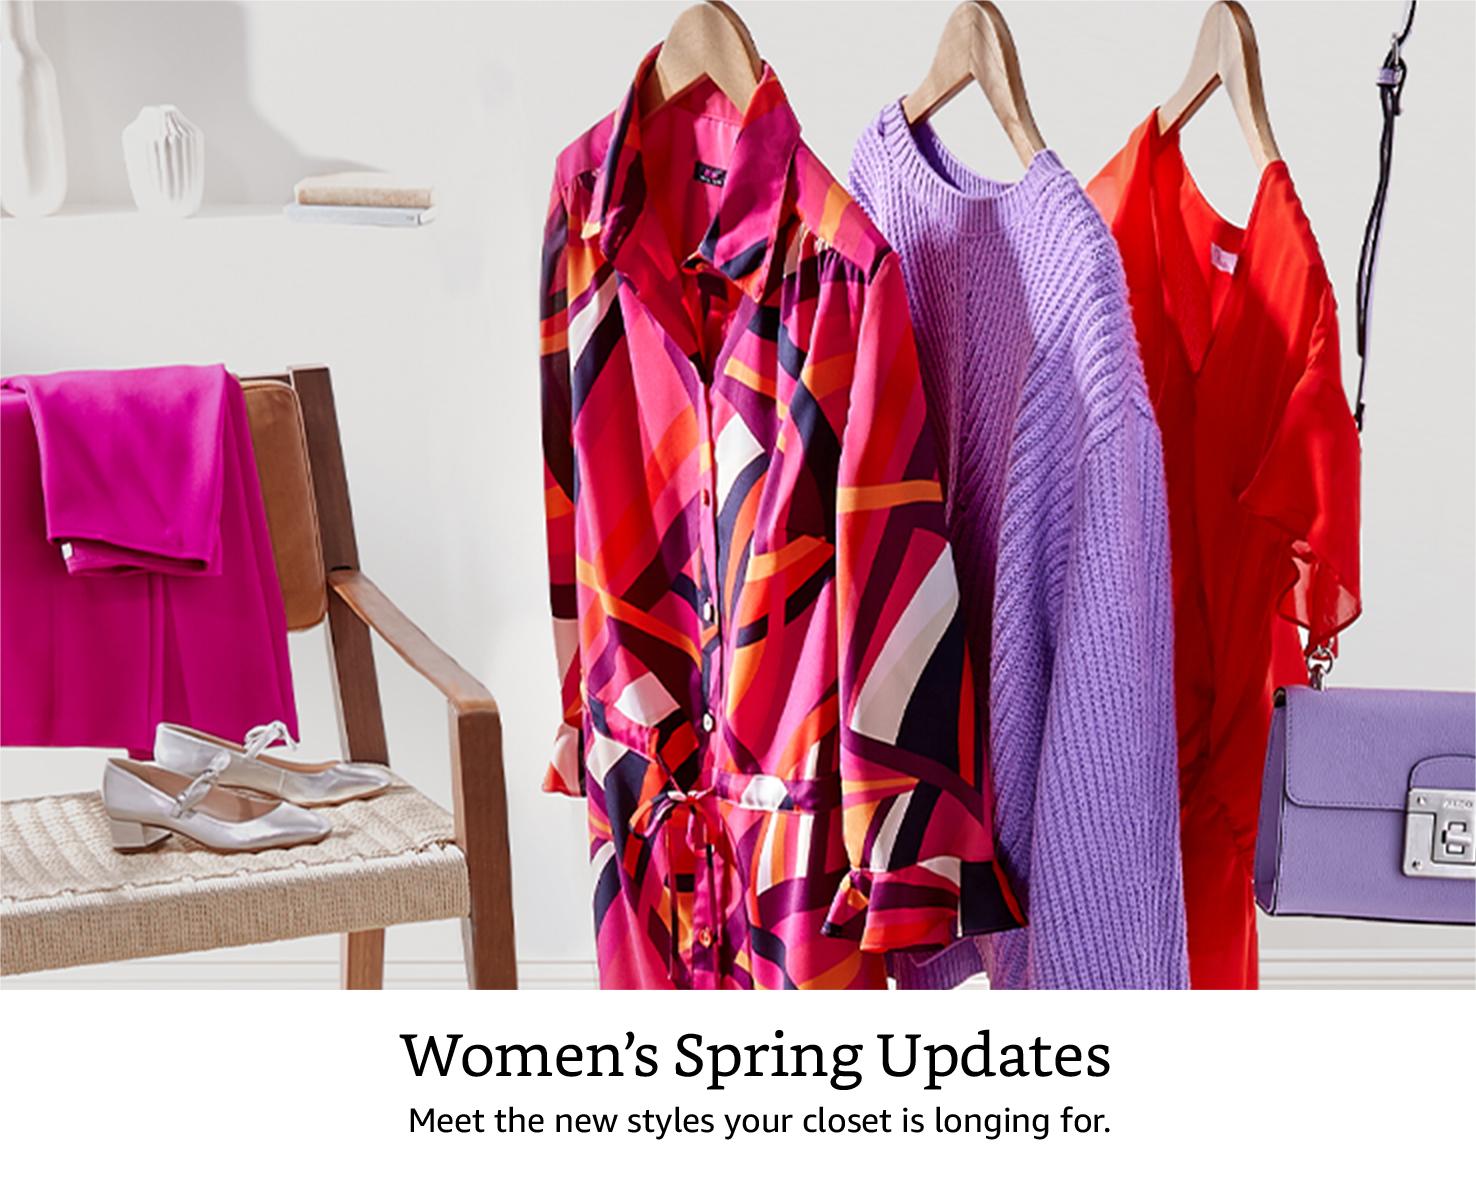 Women's Spring Updates